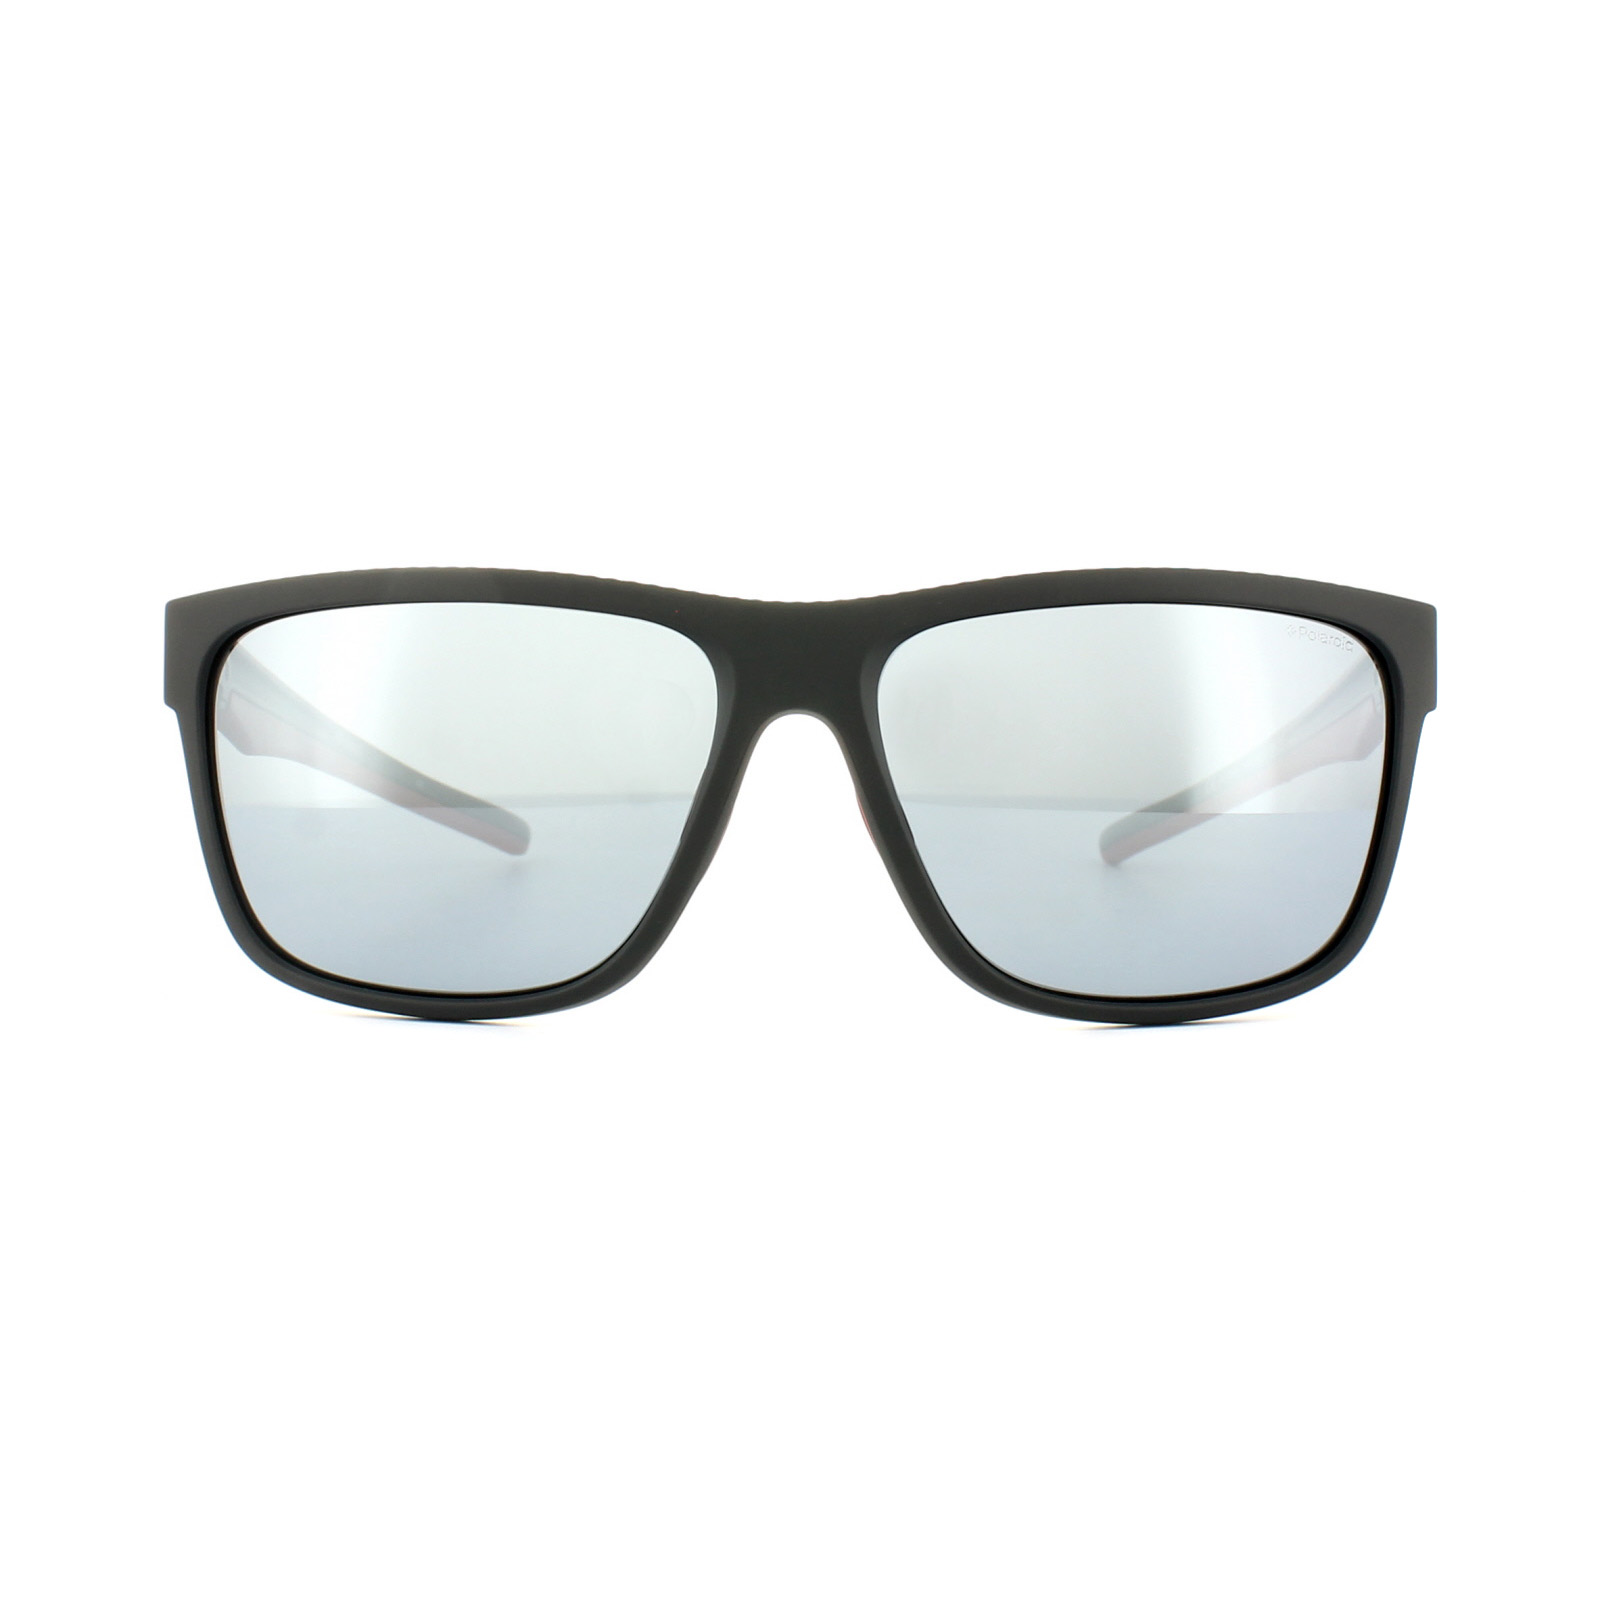 dc32aea1e8 Sentinel Polaroid Sport Sunglasses PLD 7014 S OIT EX Black Red Silver  Mirror Polarized